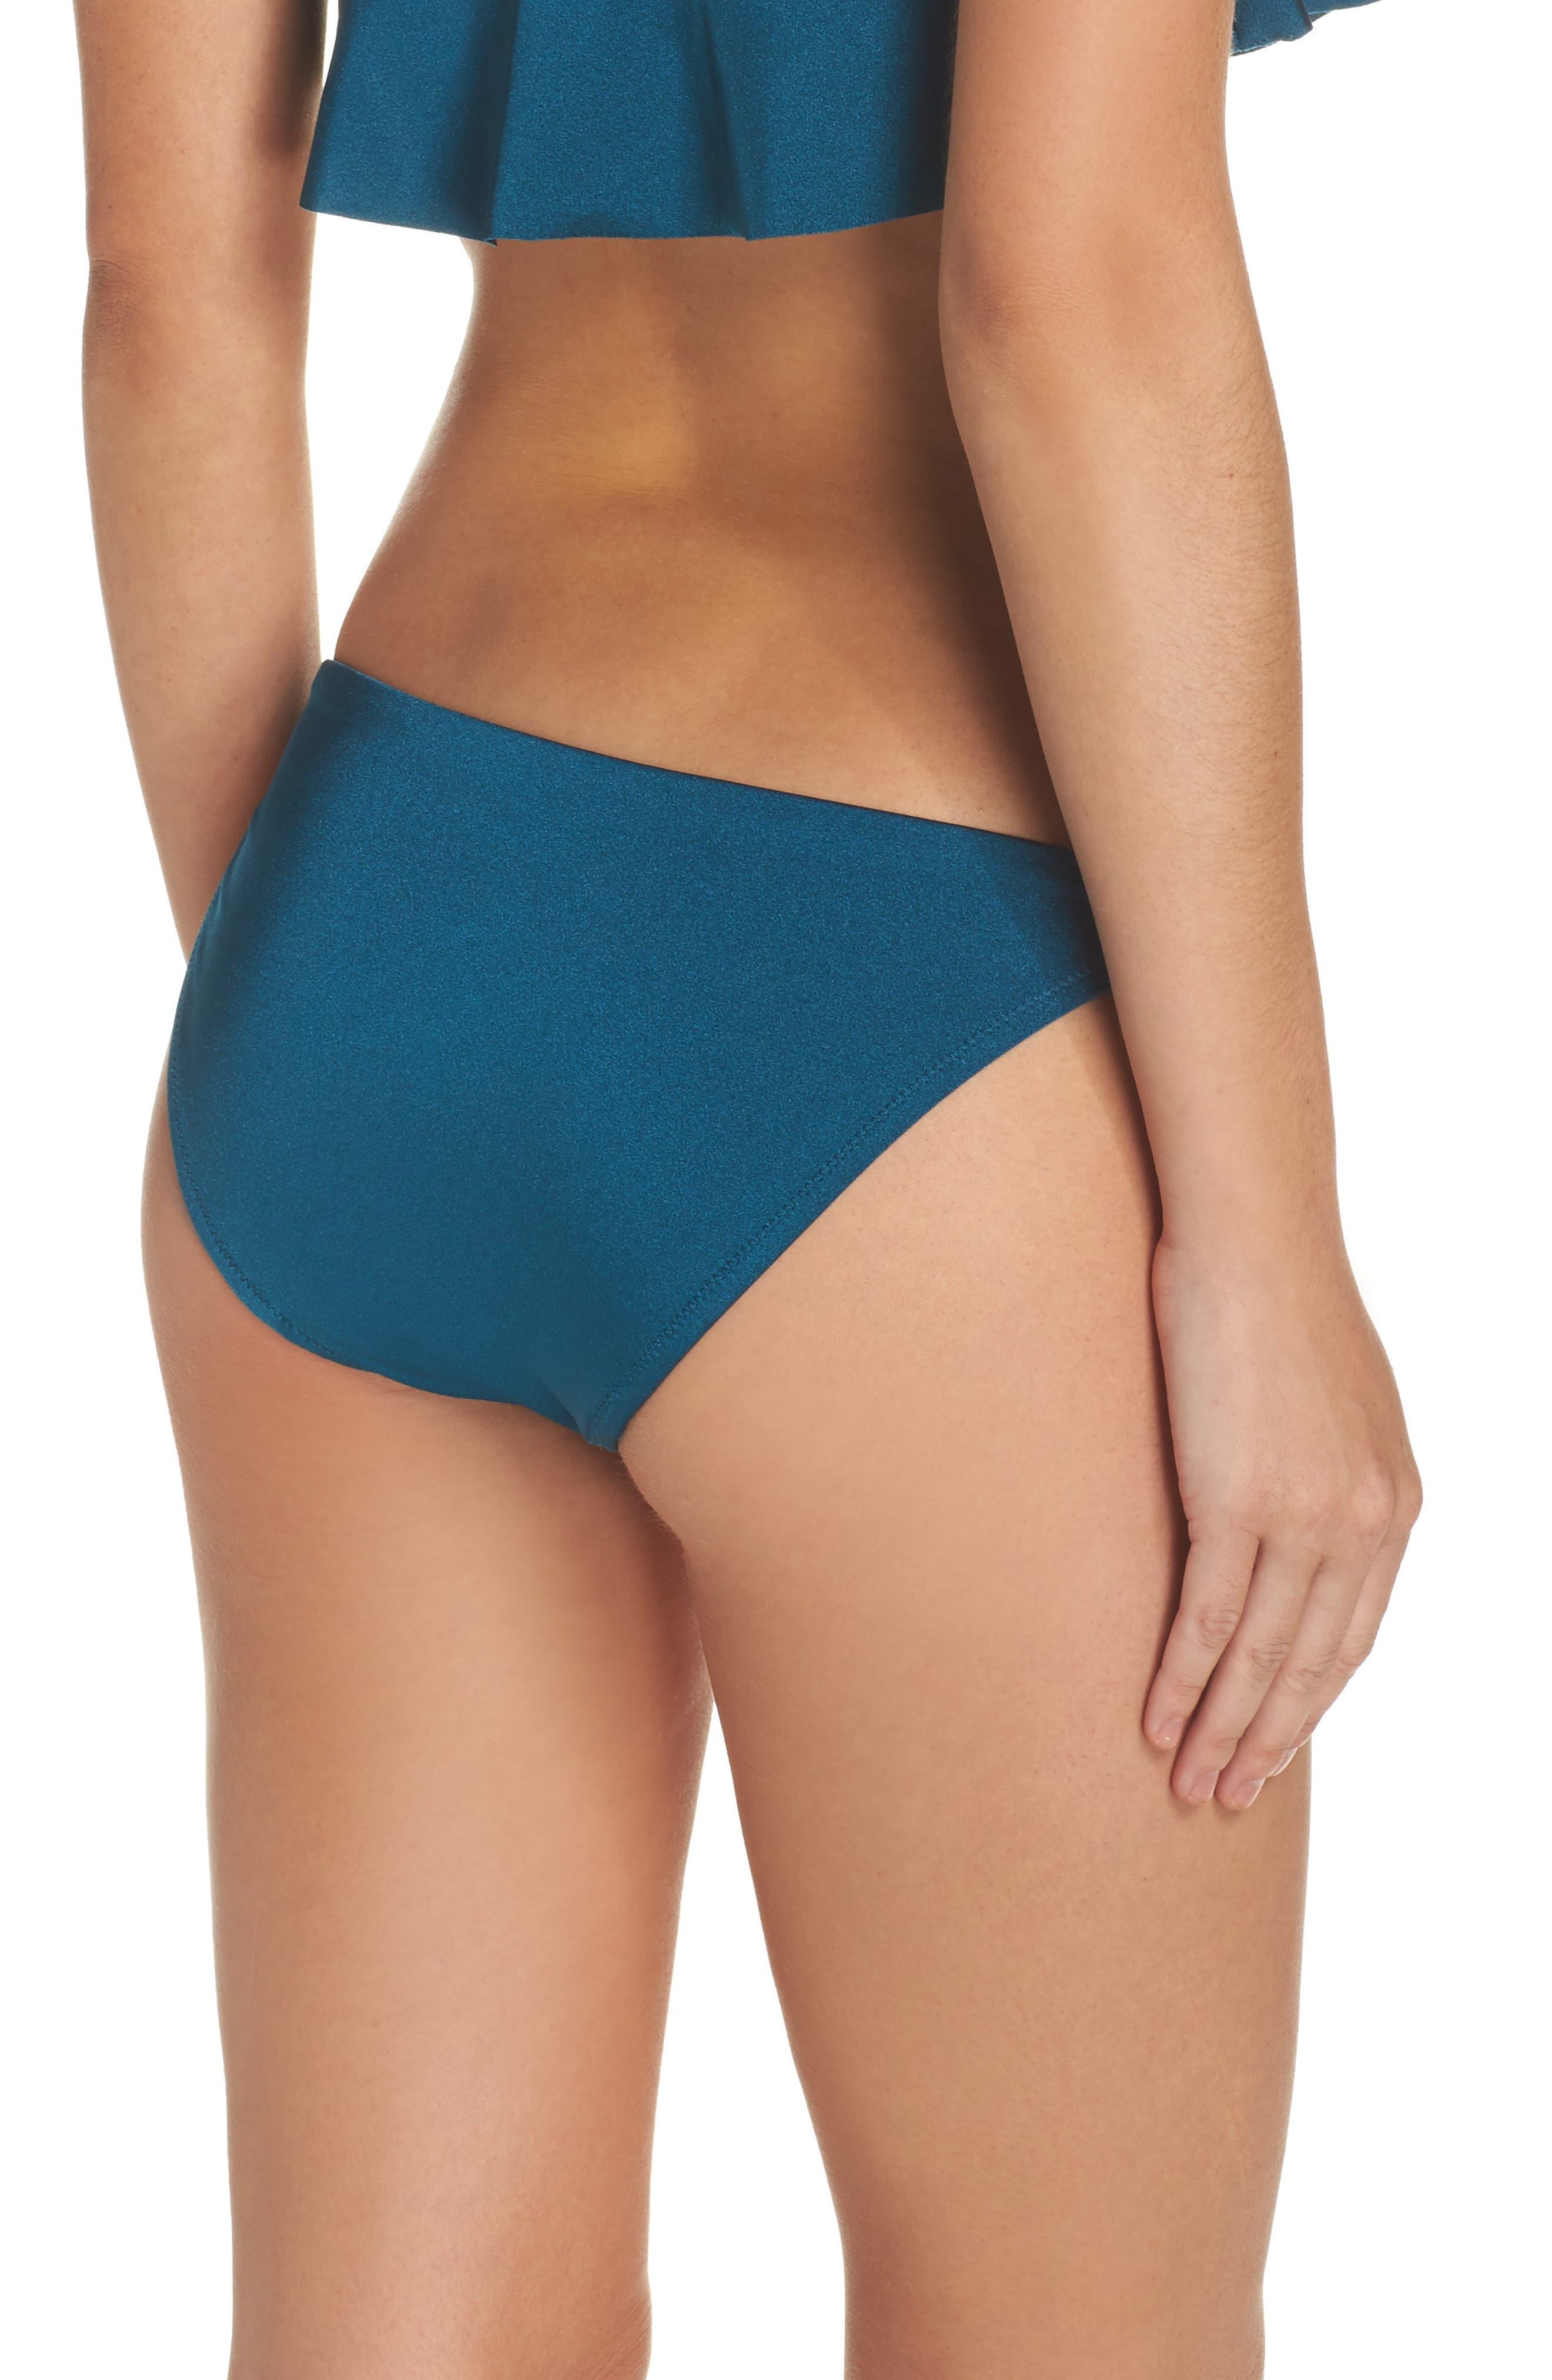 St. Lucia Bikini Bottoms,                             Alternate thumbnail 2, color,                             445